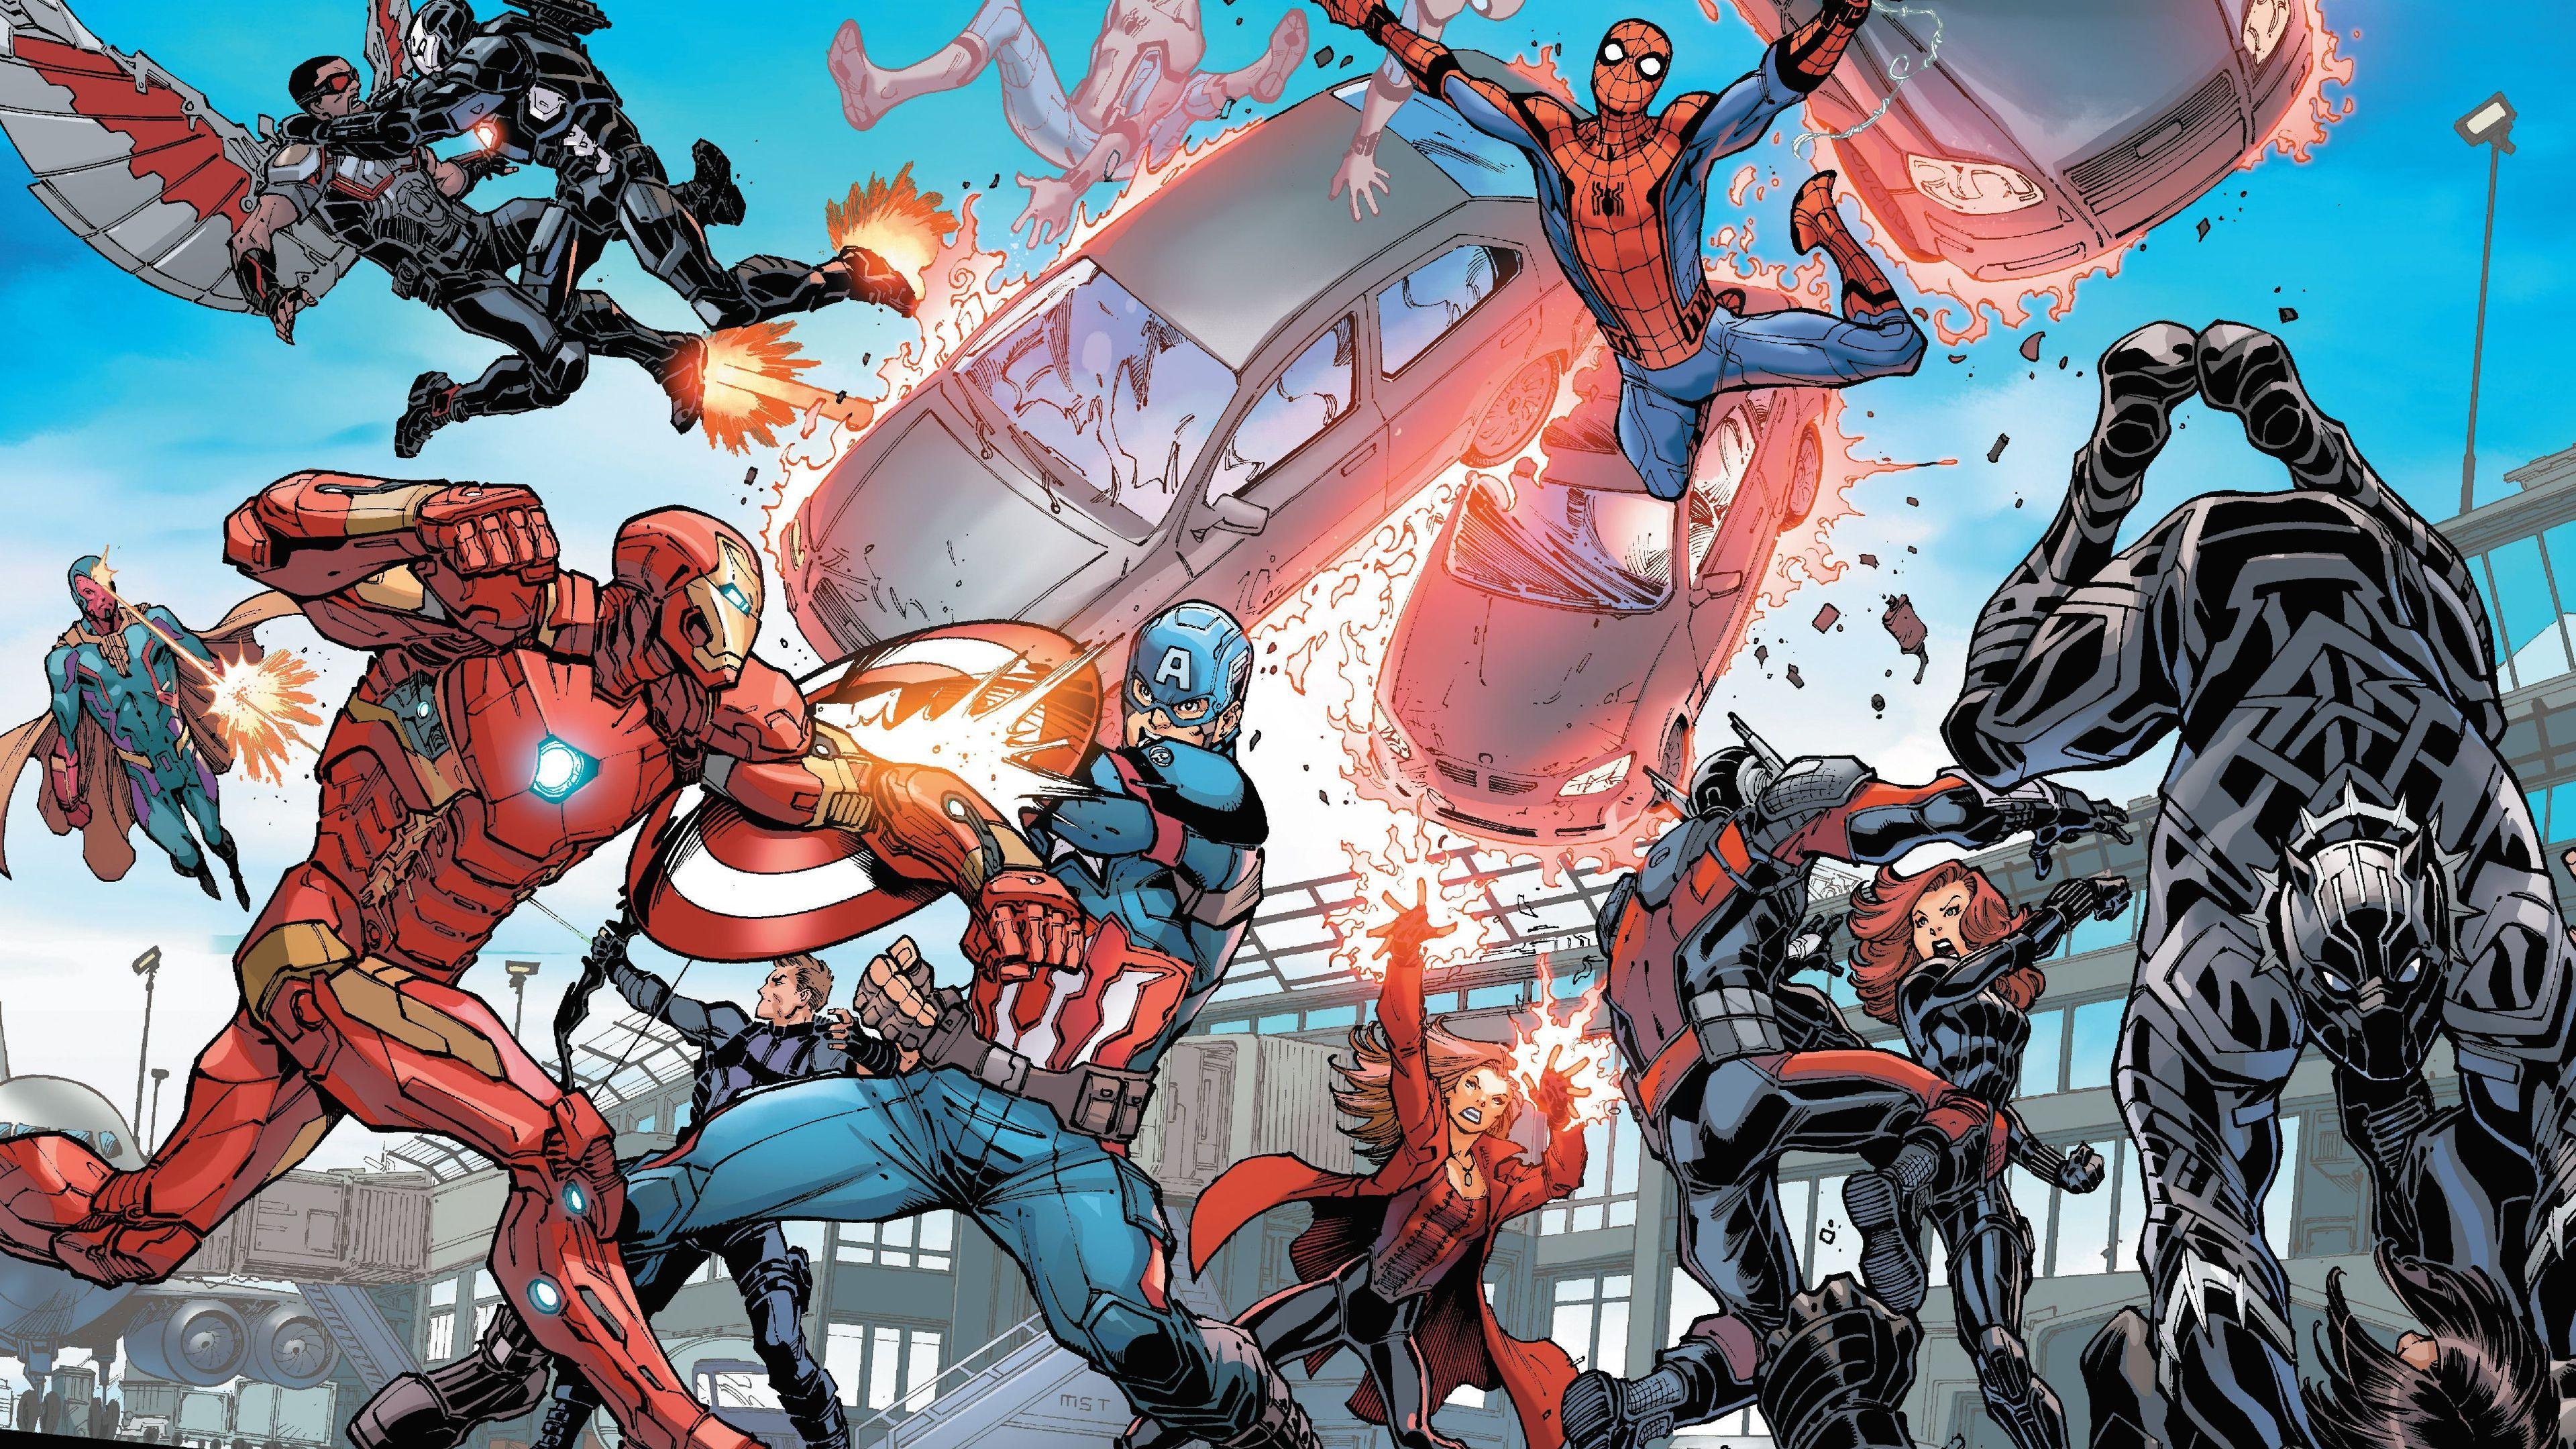 Wallpaper 4k Captain America Civil War Artwork 4k 4k